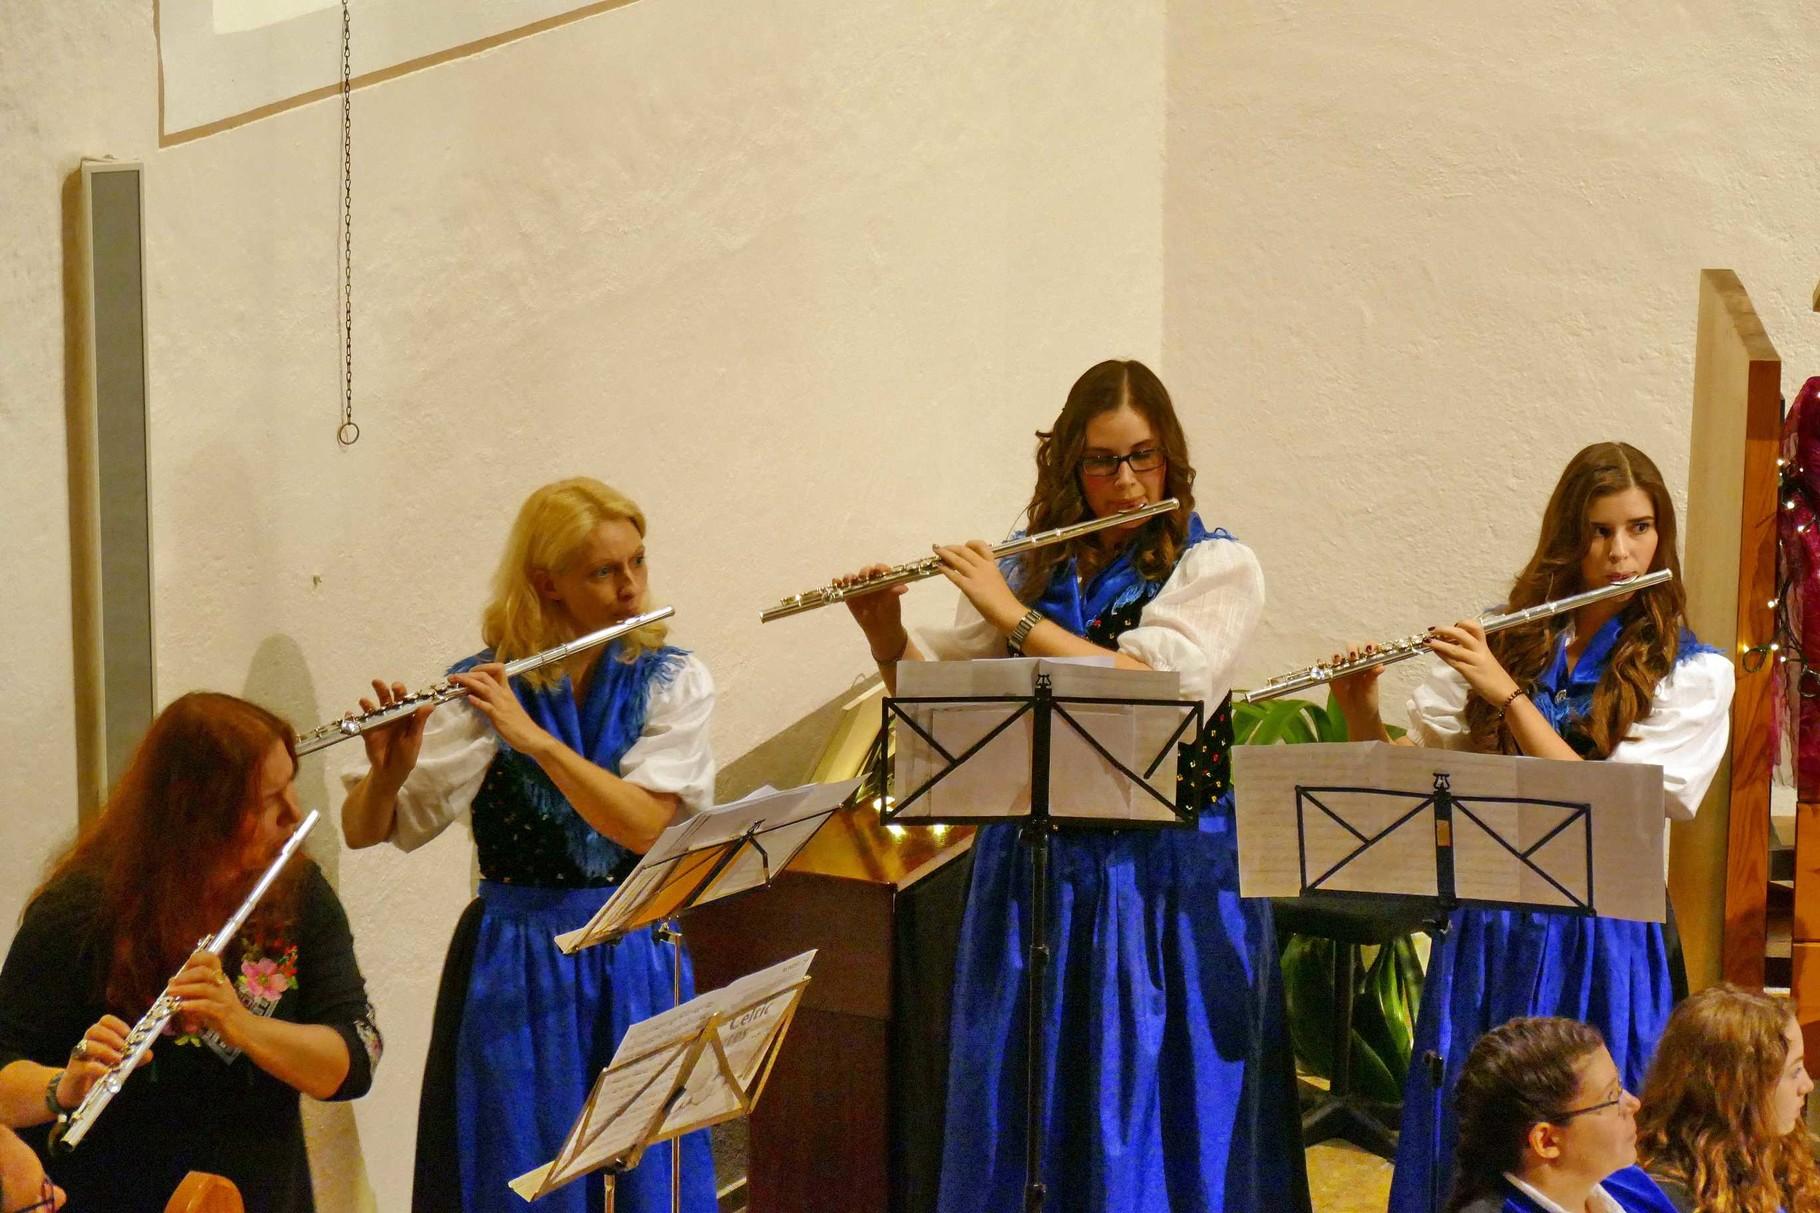 Die Solistinnen Irena Soloducha-Moleta, Monika Kretschmann, Julia Seeger und Jana Seeger bei Celtic Flutes